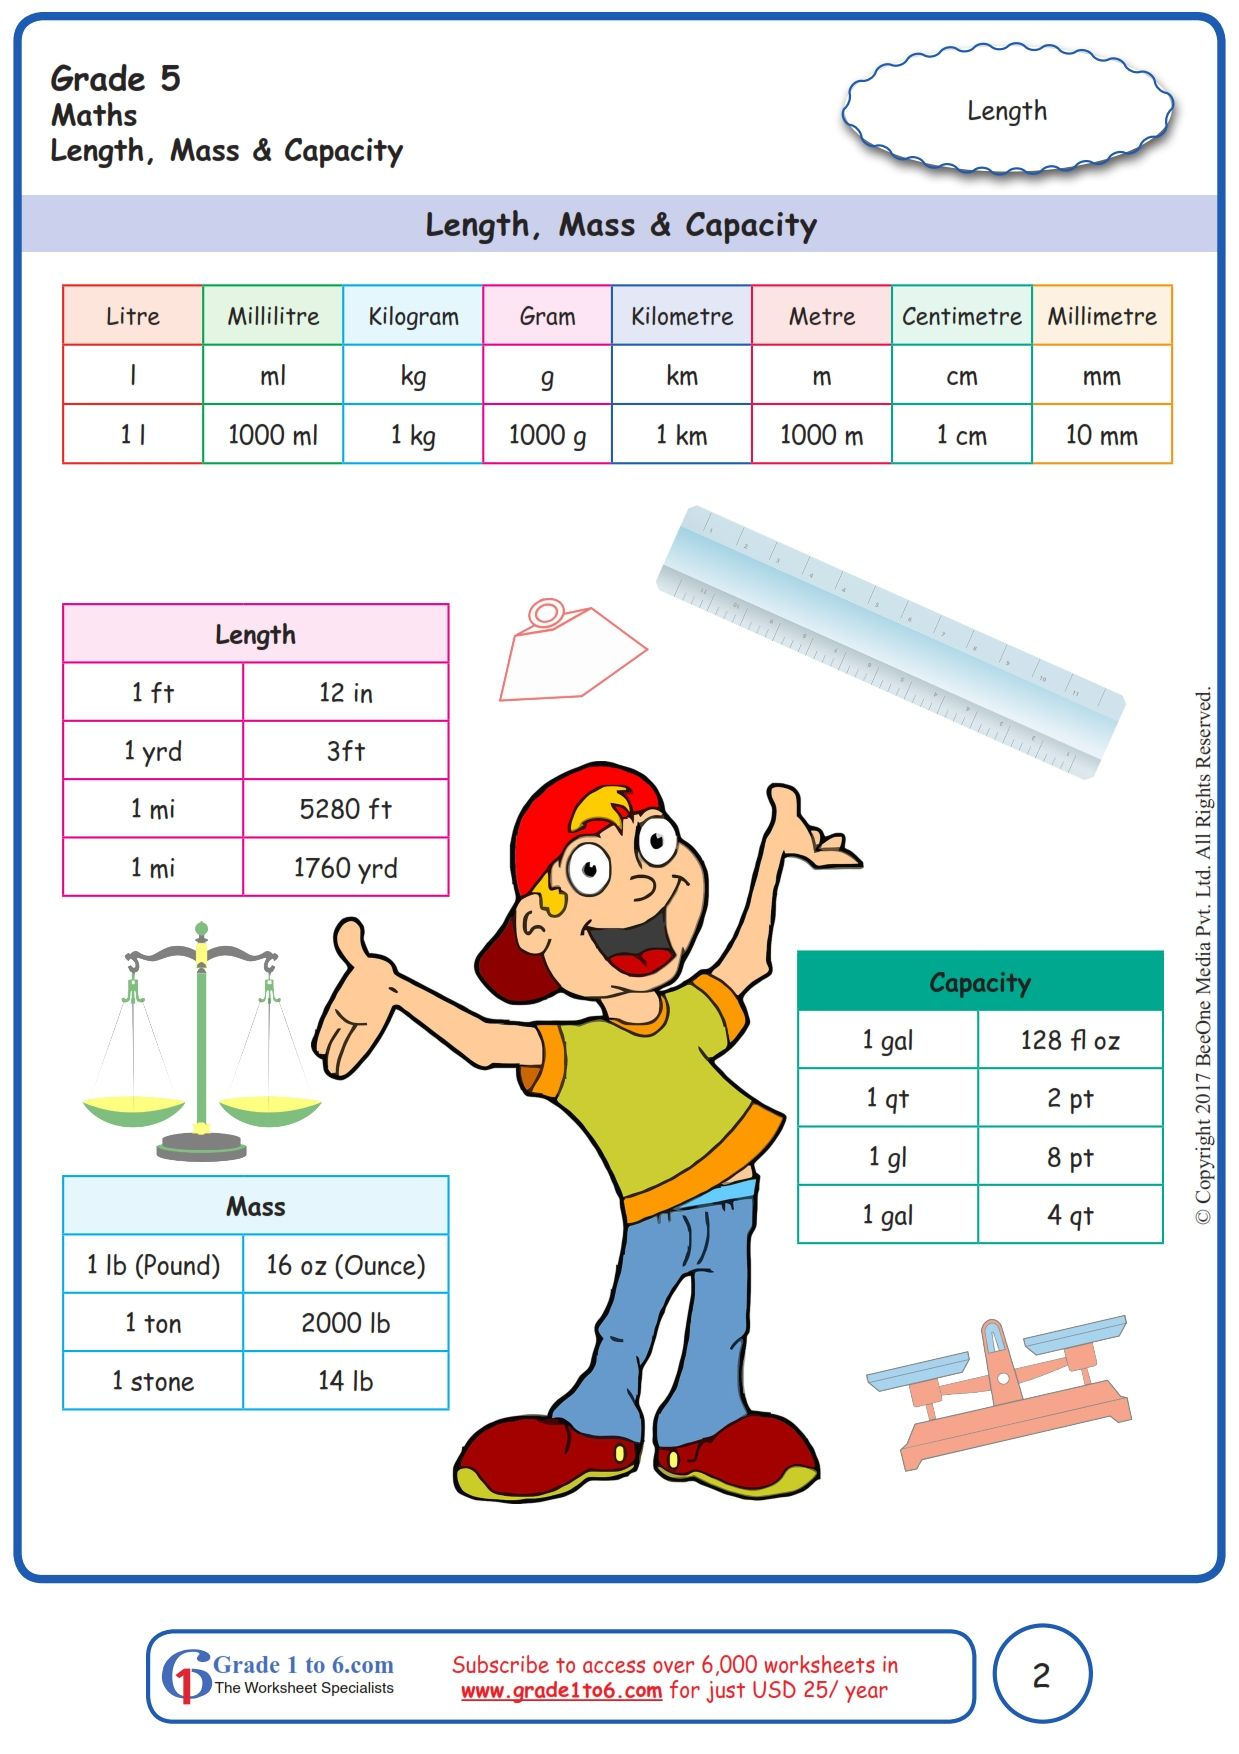 hight resolution of Worksheet Grade 5 Math Length Mass \u0026 Capacity   Free math worksheets